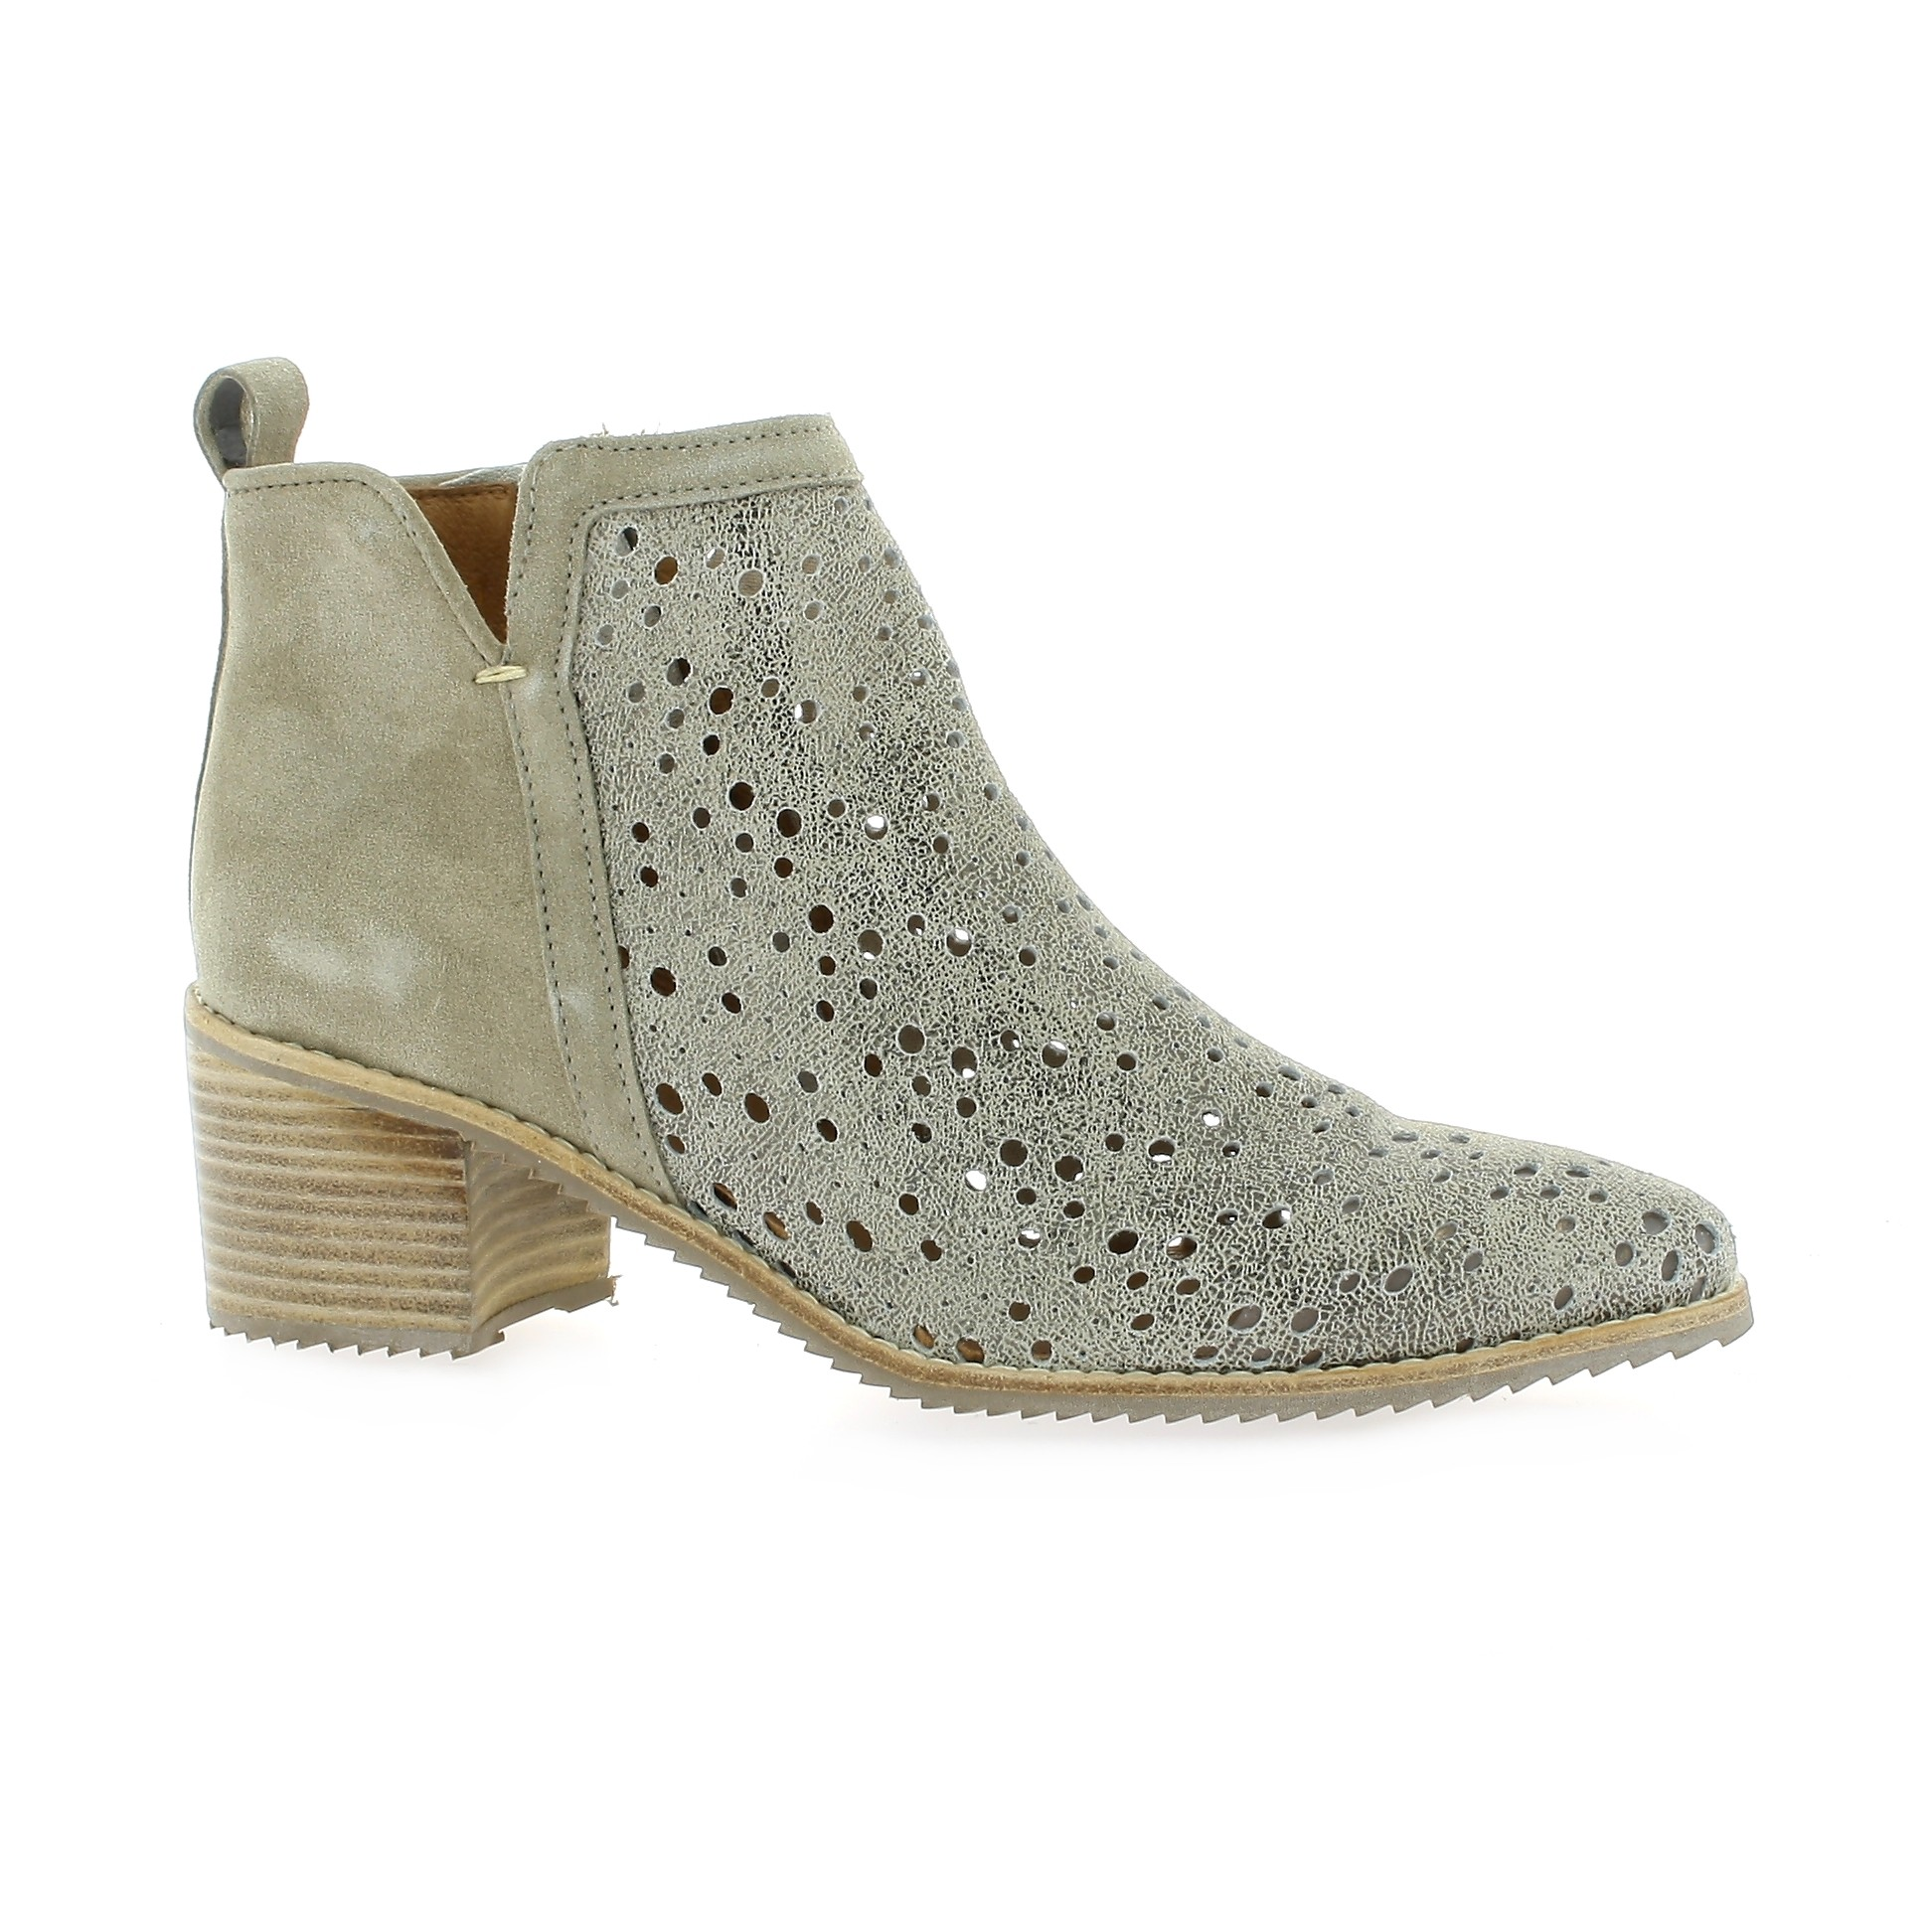 boots femme minka,minka design boots femme kiana taupe 4bbdbfdd0afc